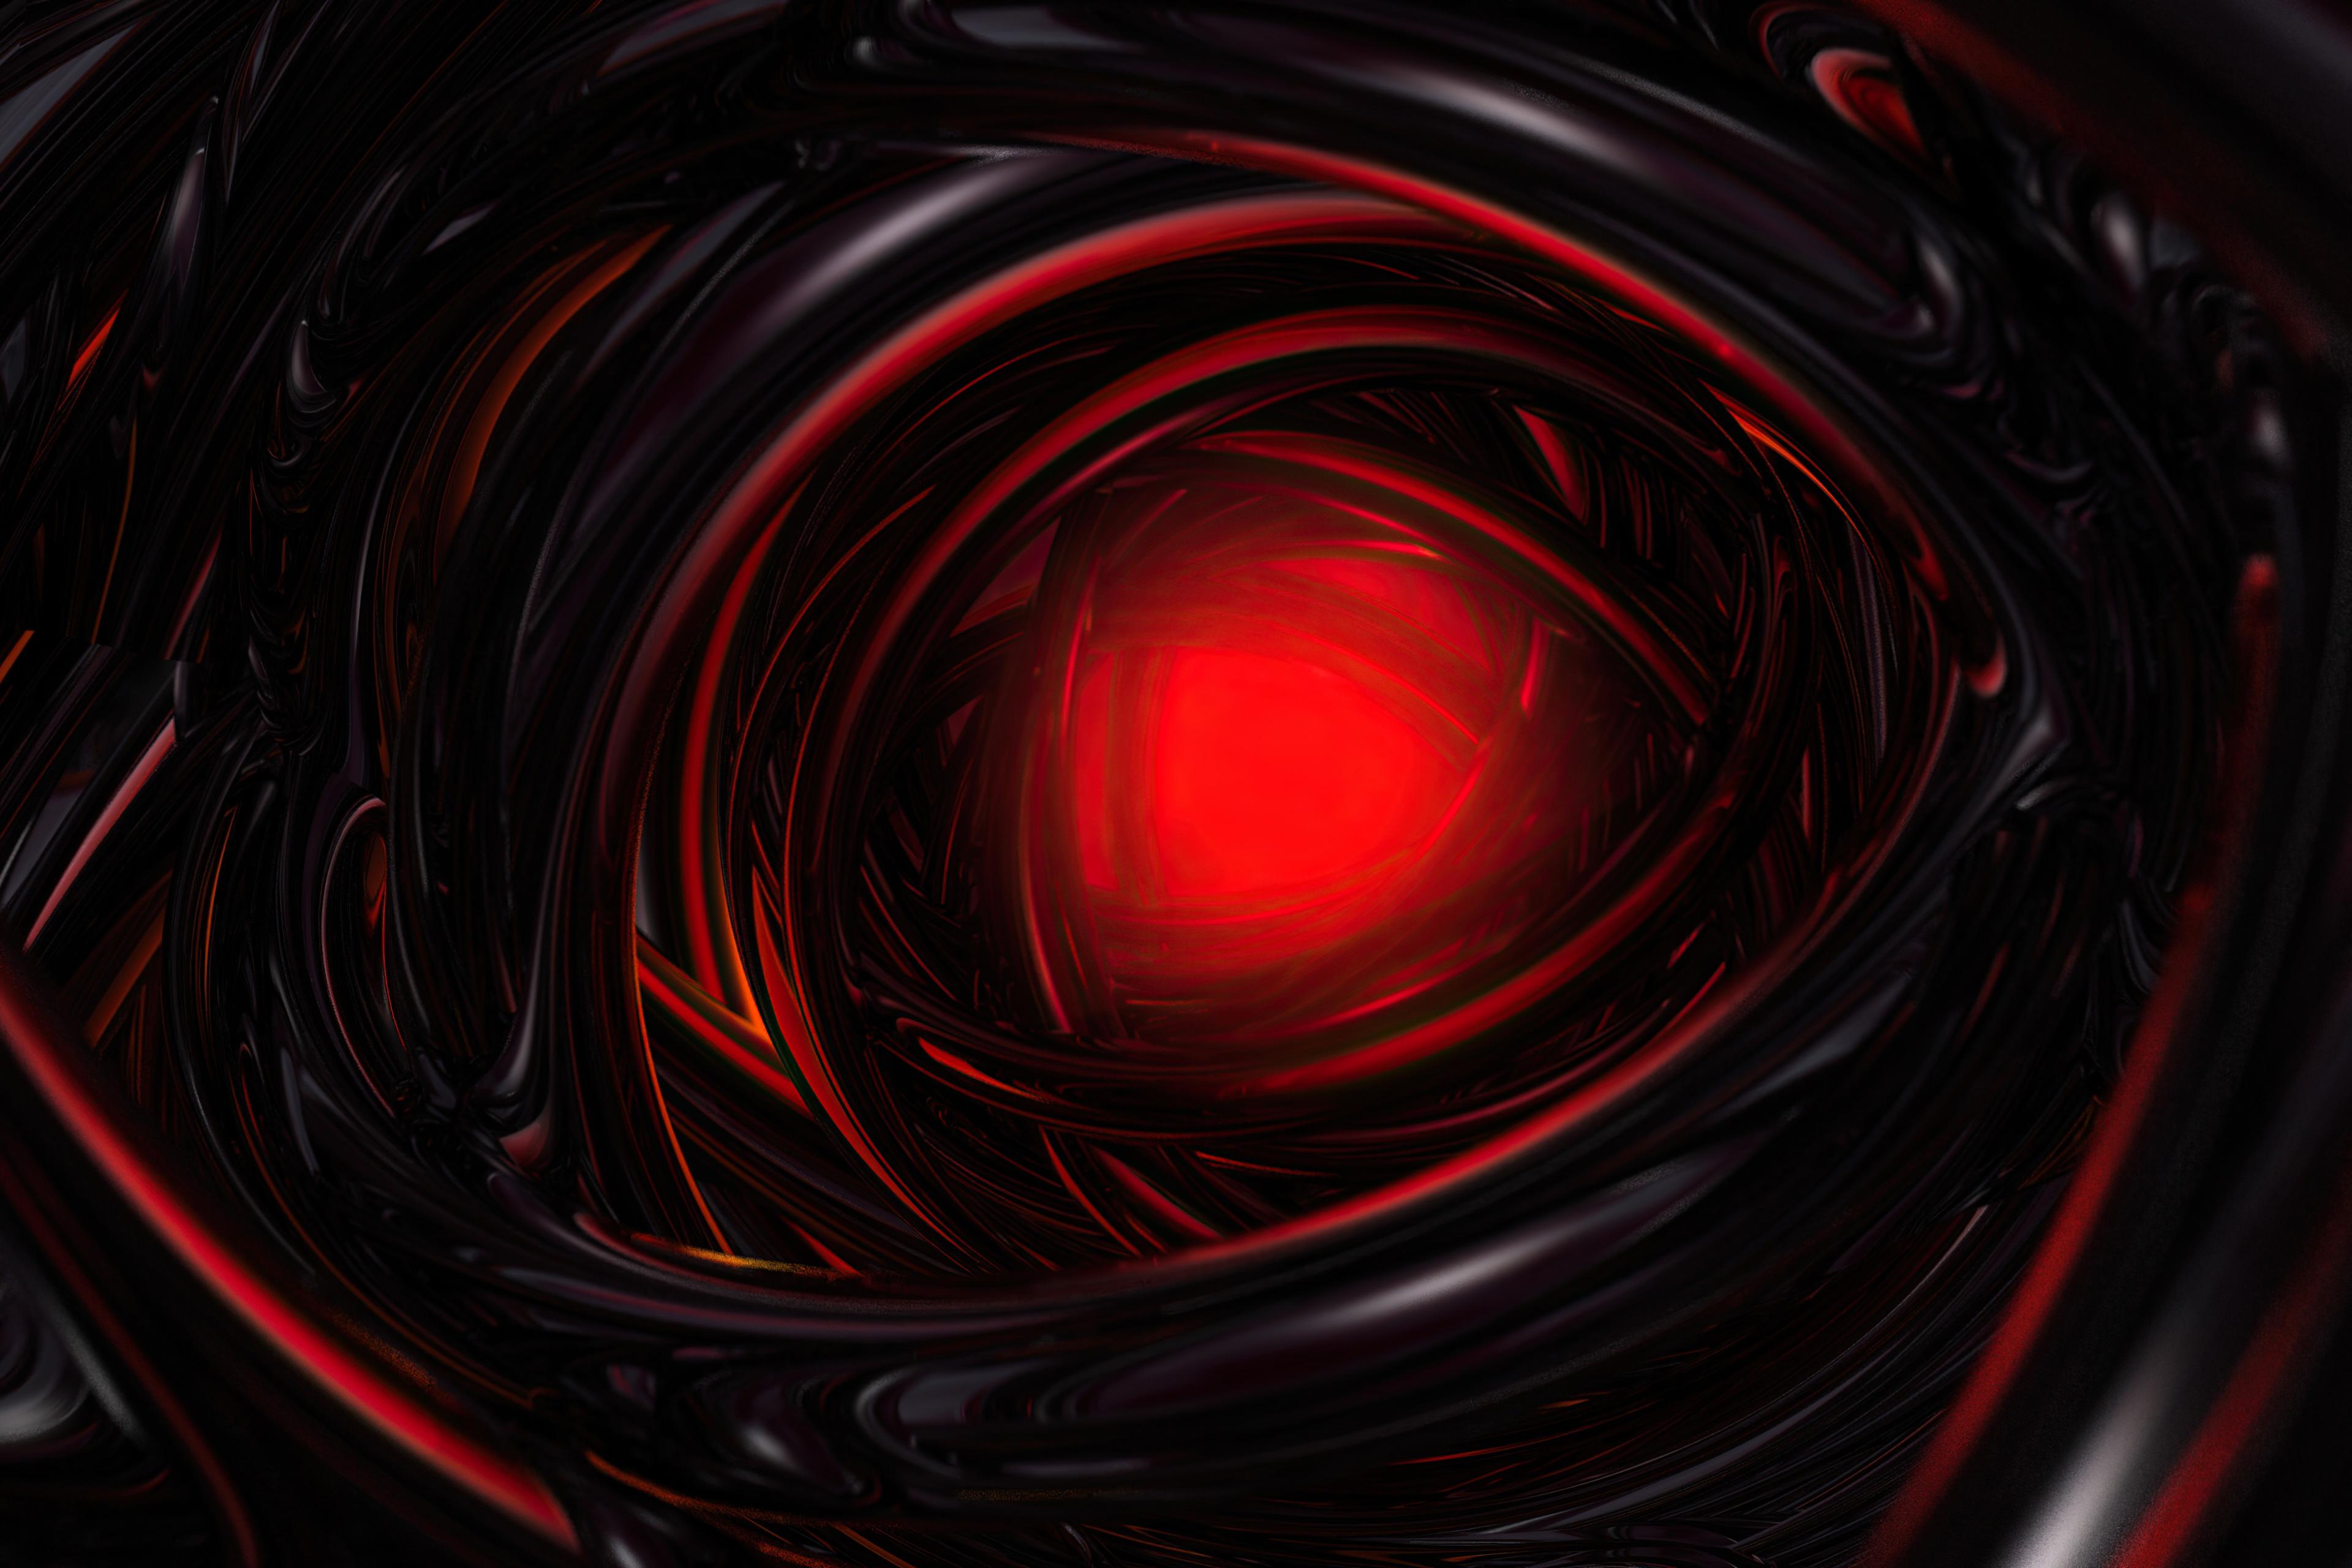 opaque red 4k 1620165380 - Opaque Red 4k - Opaque Red 4k wallpapers